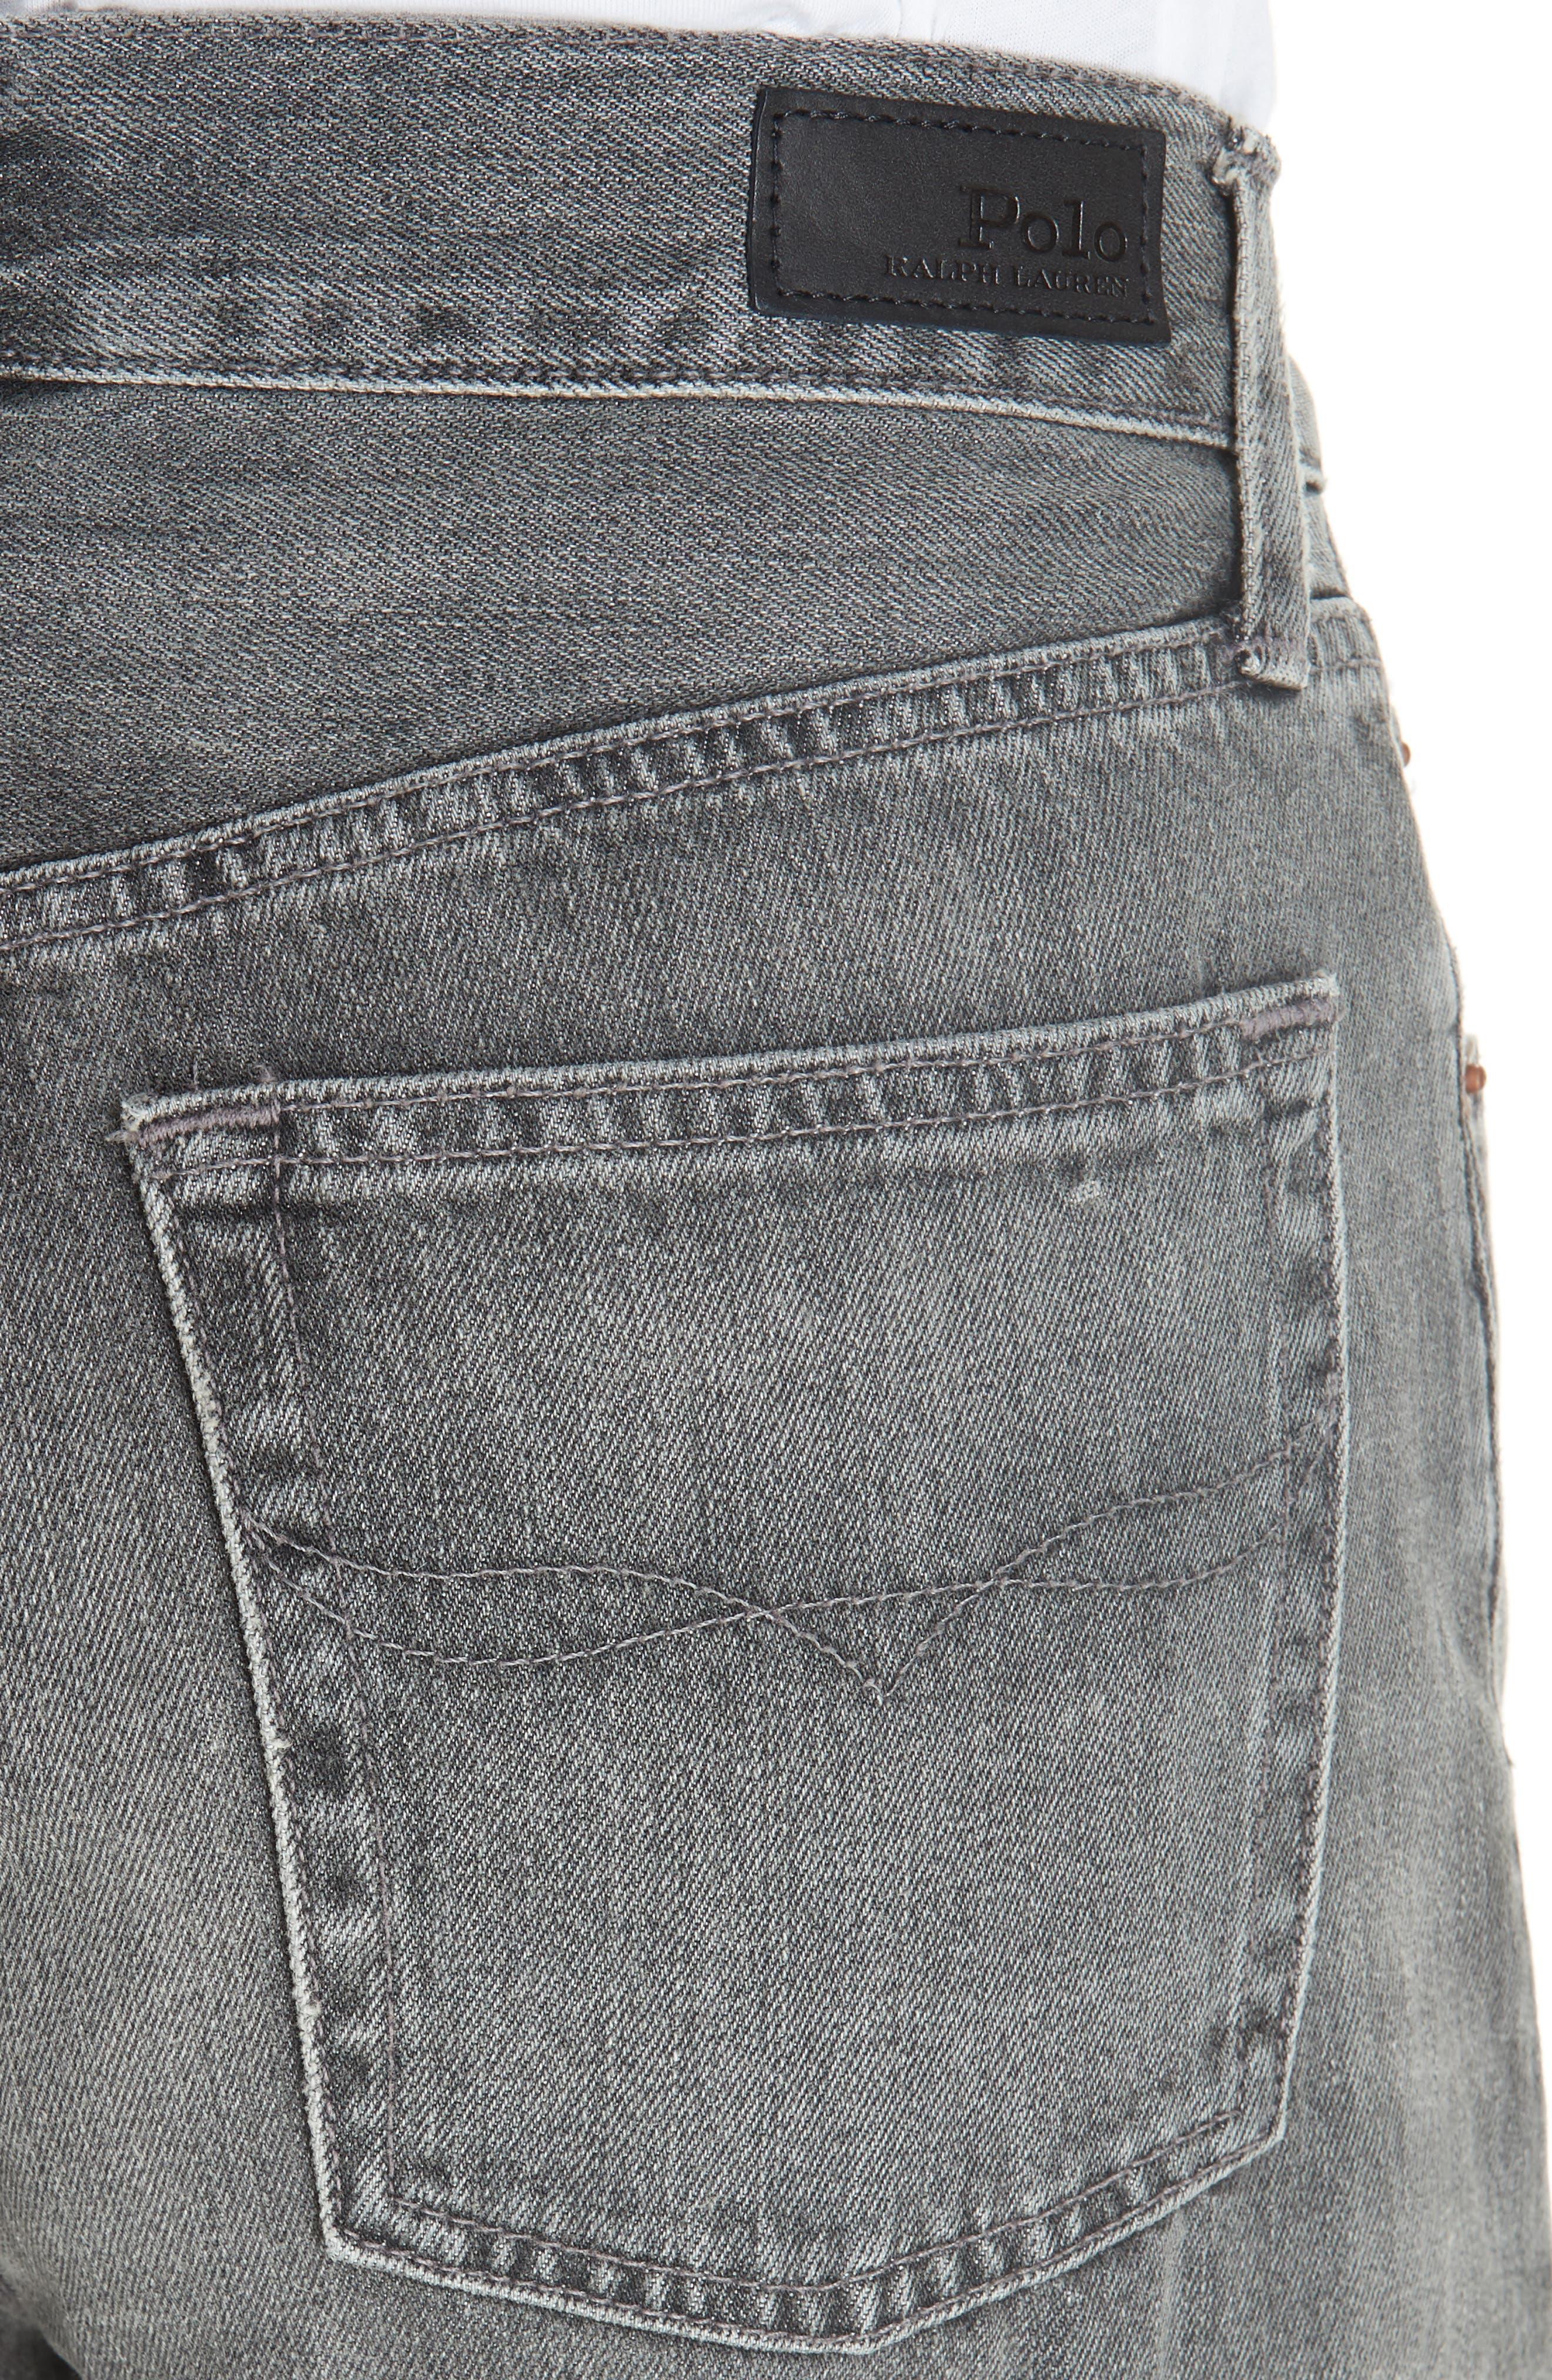 High Waist Slim Straight Crop Jeans,                             Alternate thumbnail 4, color,                             020